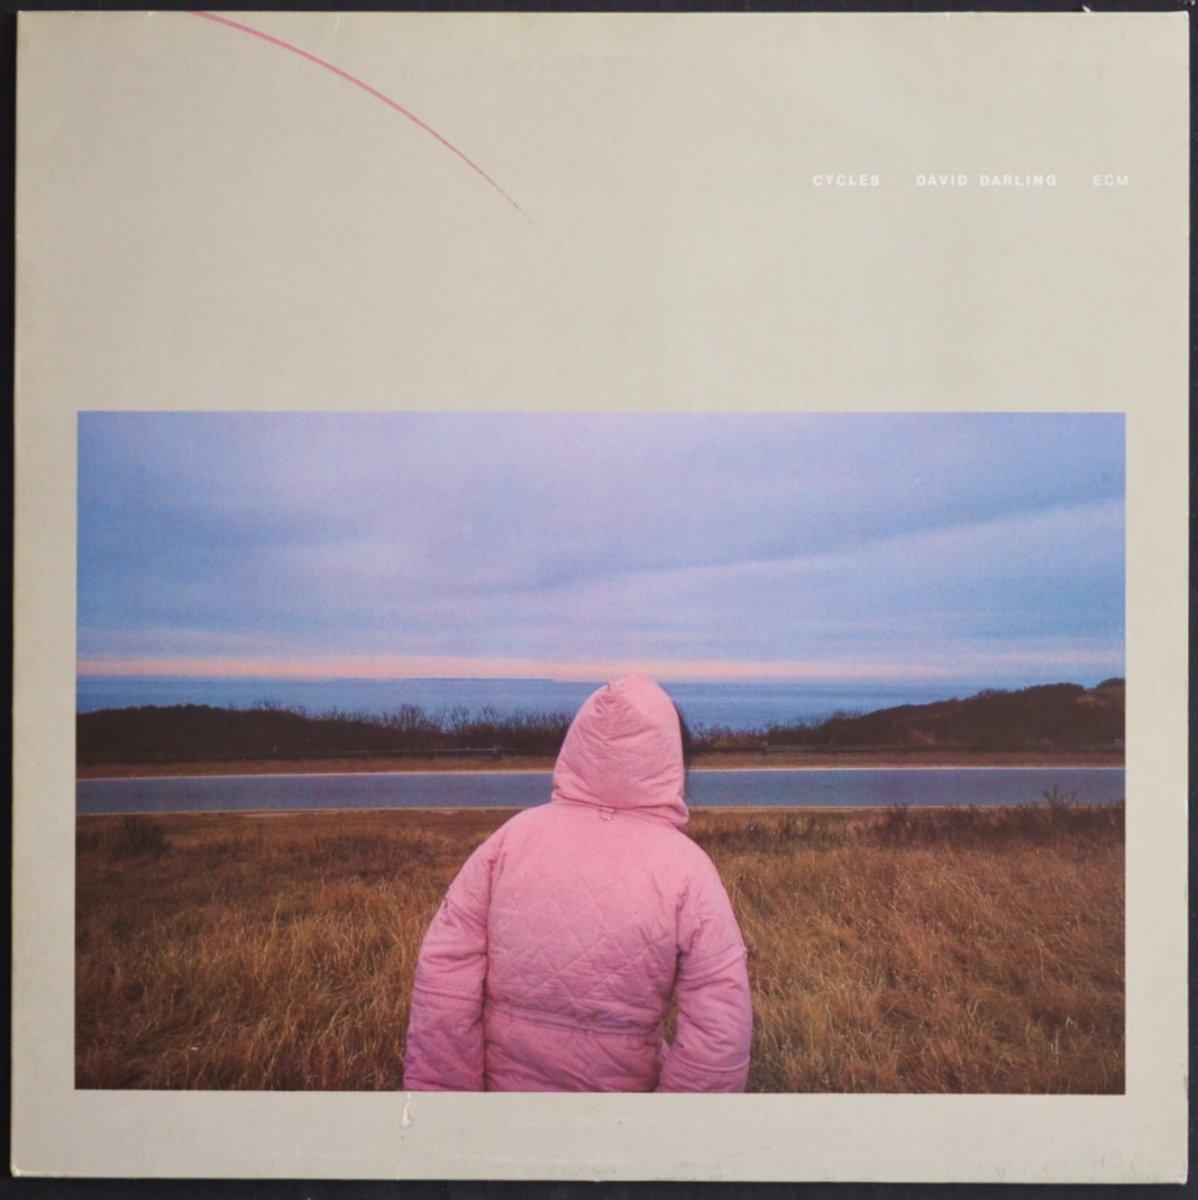 DAVID DARLING / CYCLES (LP)